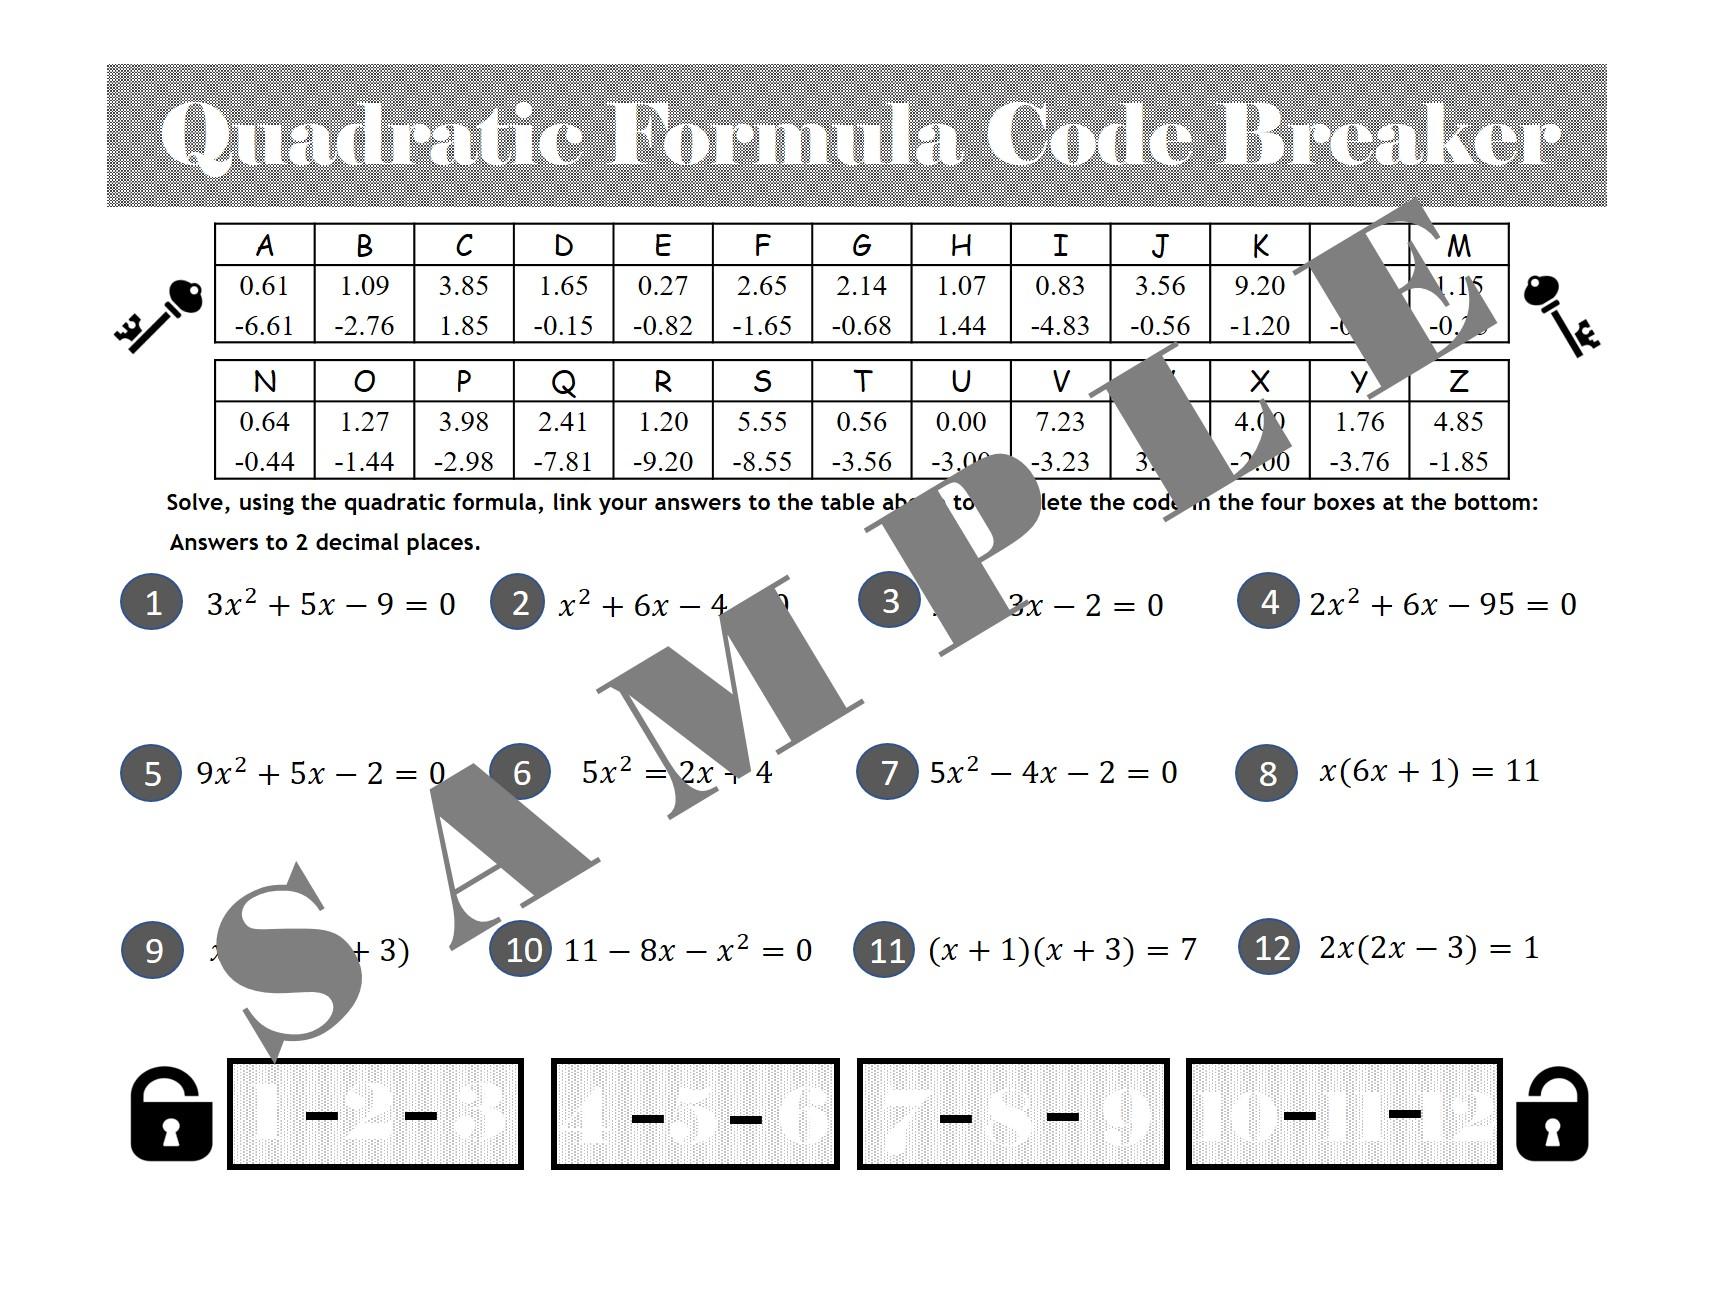 Quadratic Formula Code Breaker Activity